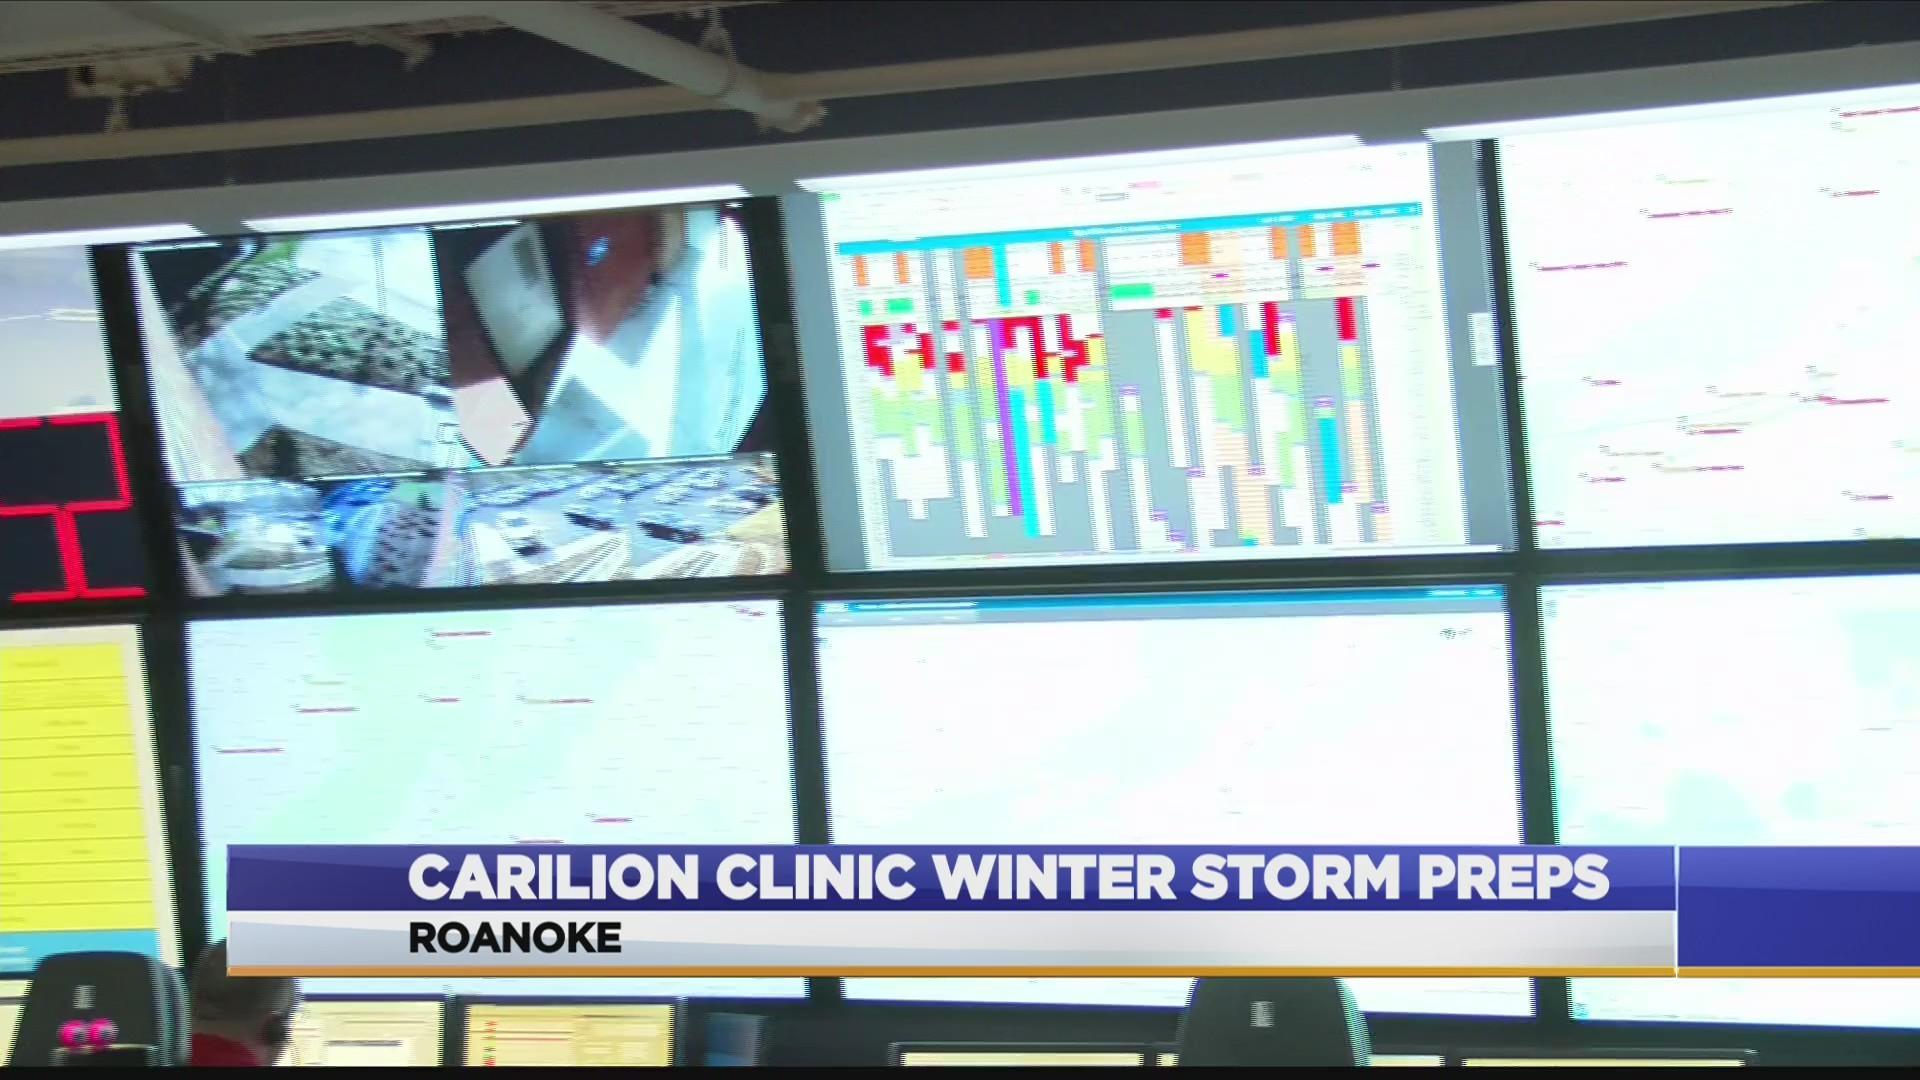 Carilion_Clinic_Winter_Storm_Preps_0_20181208134220